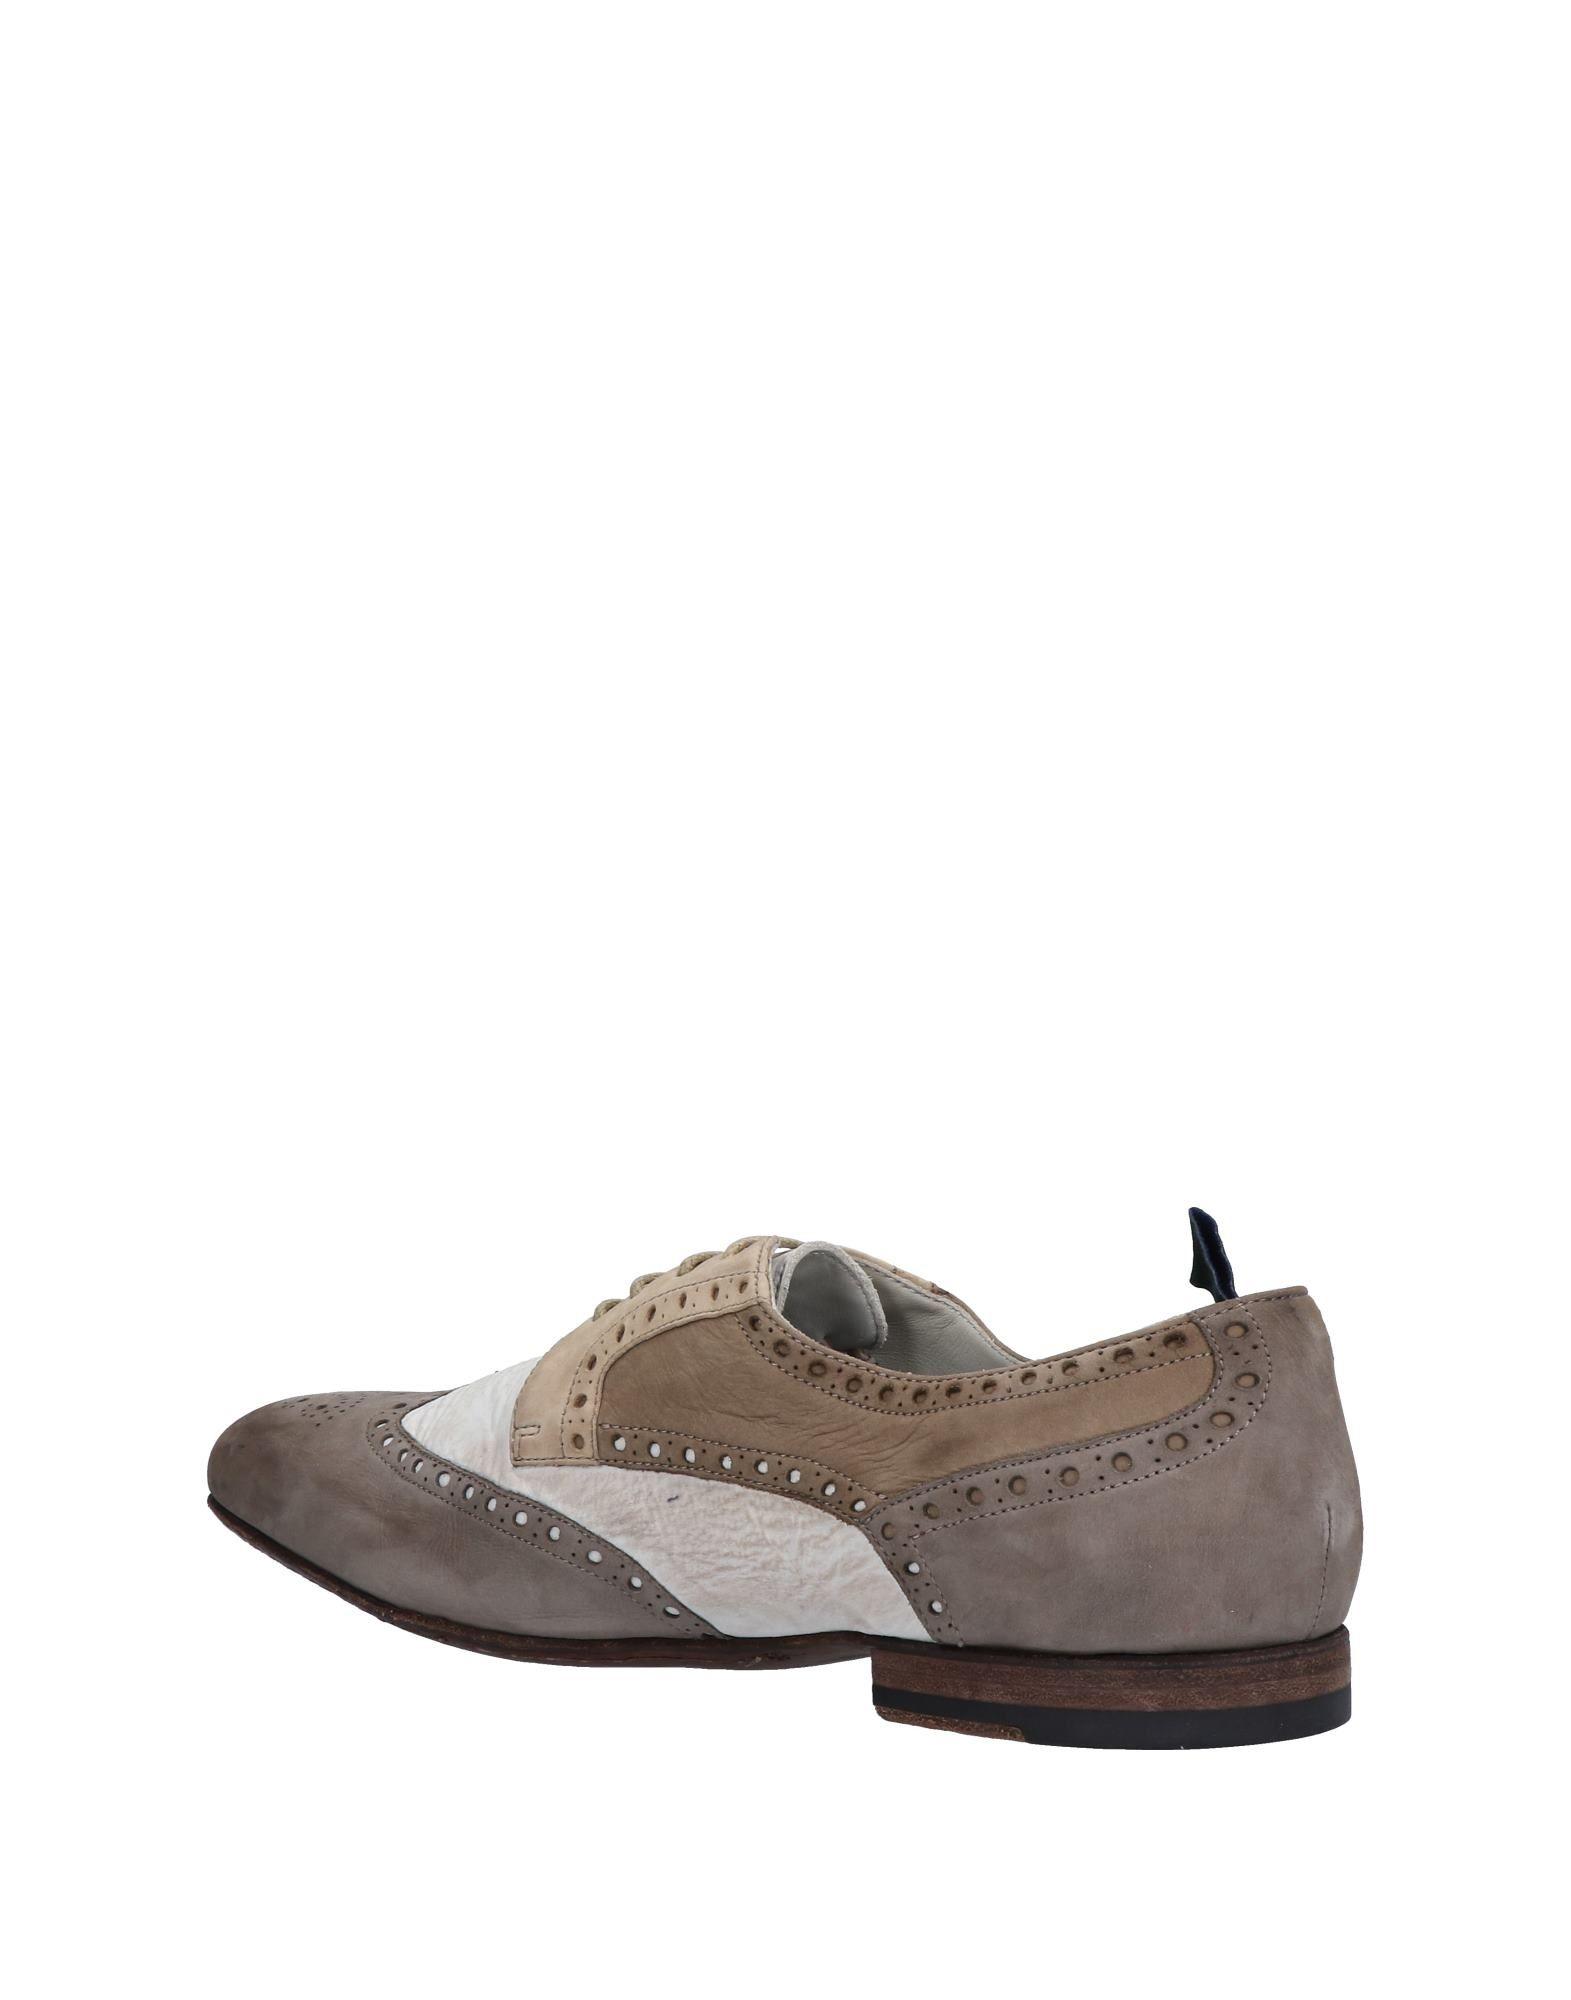 Alberto Guardiani Schnürschuhe Herren  11516383TR Gute Qualität beliebte Schuhe Schuhe Schuhe 5f6611